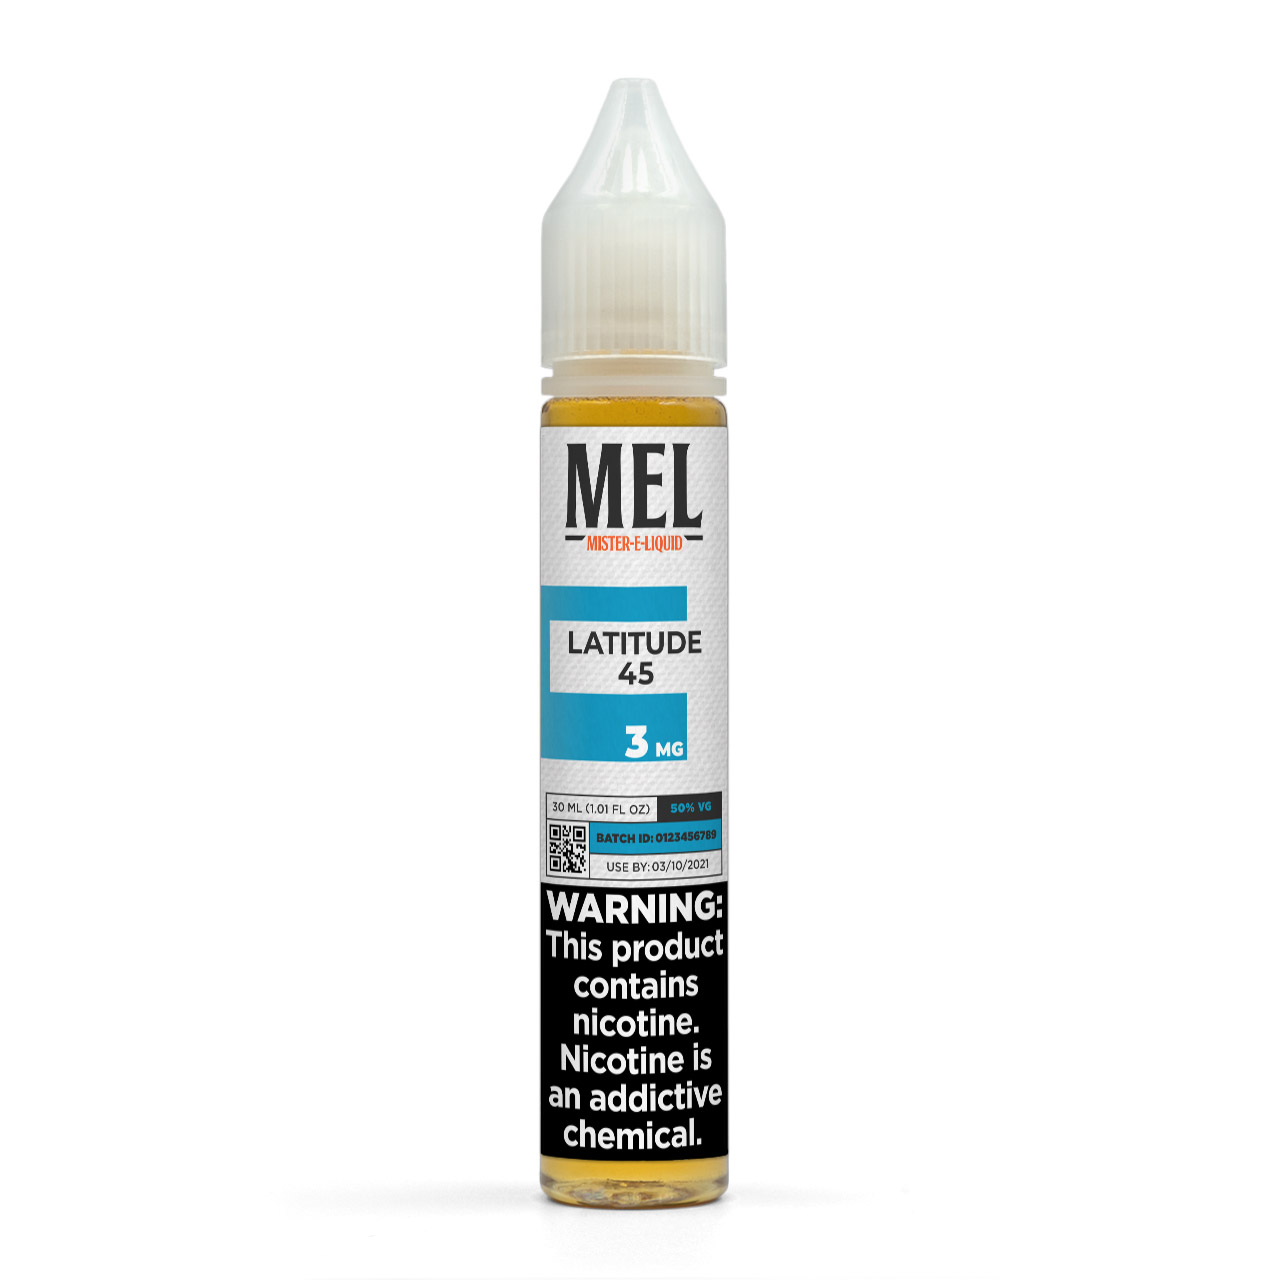 MEL Latitude 45 Vape Juice, 3 mg